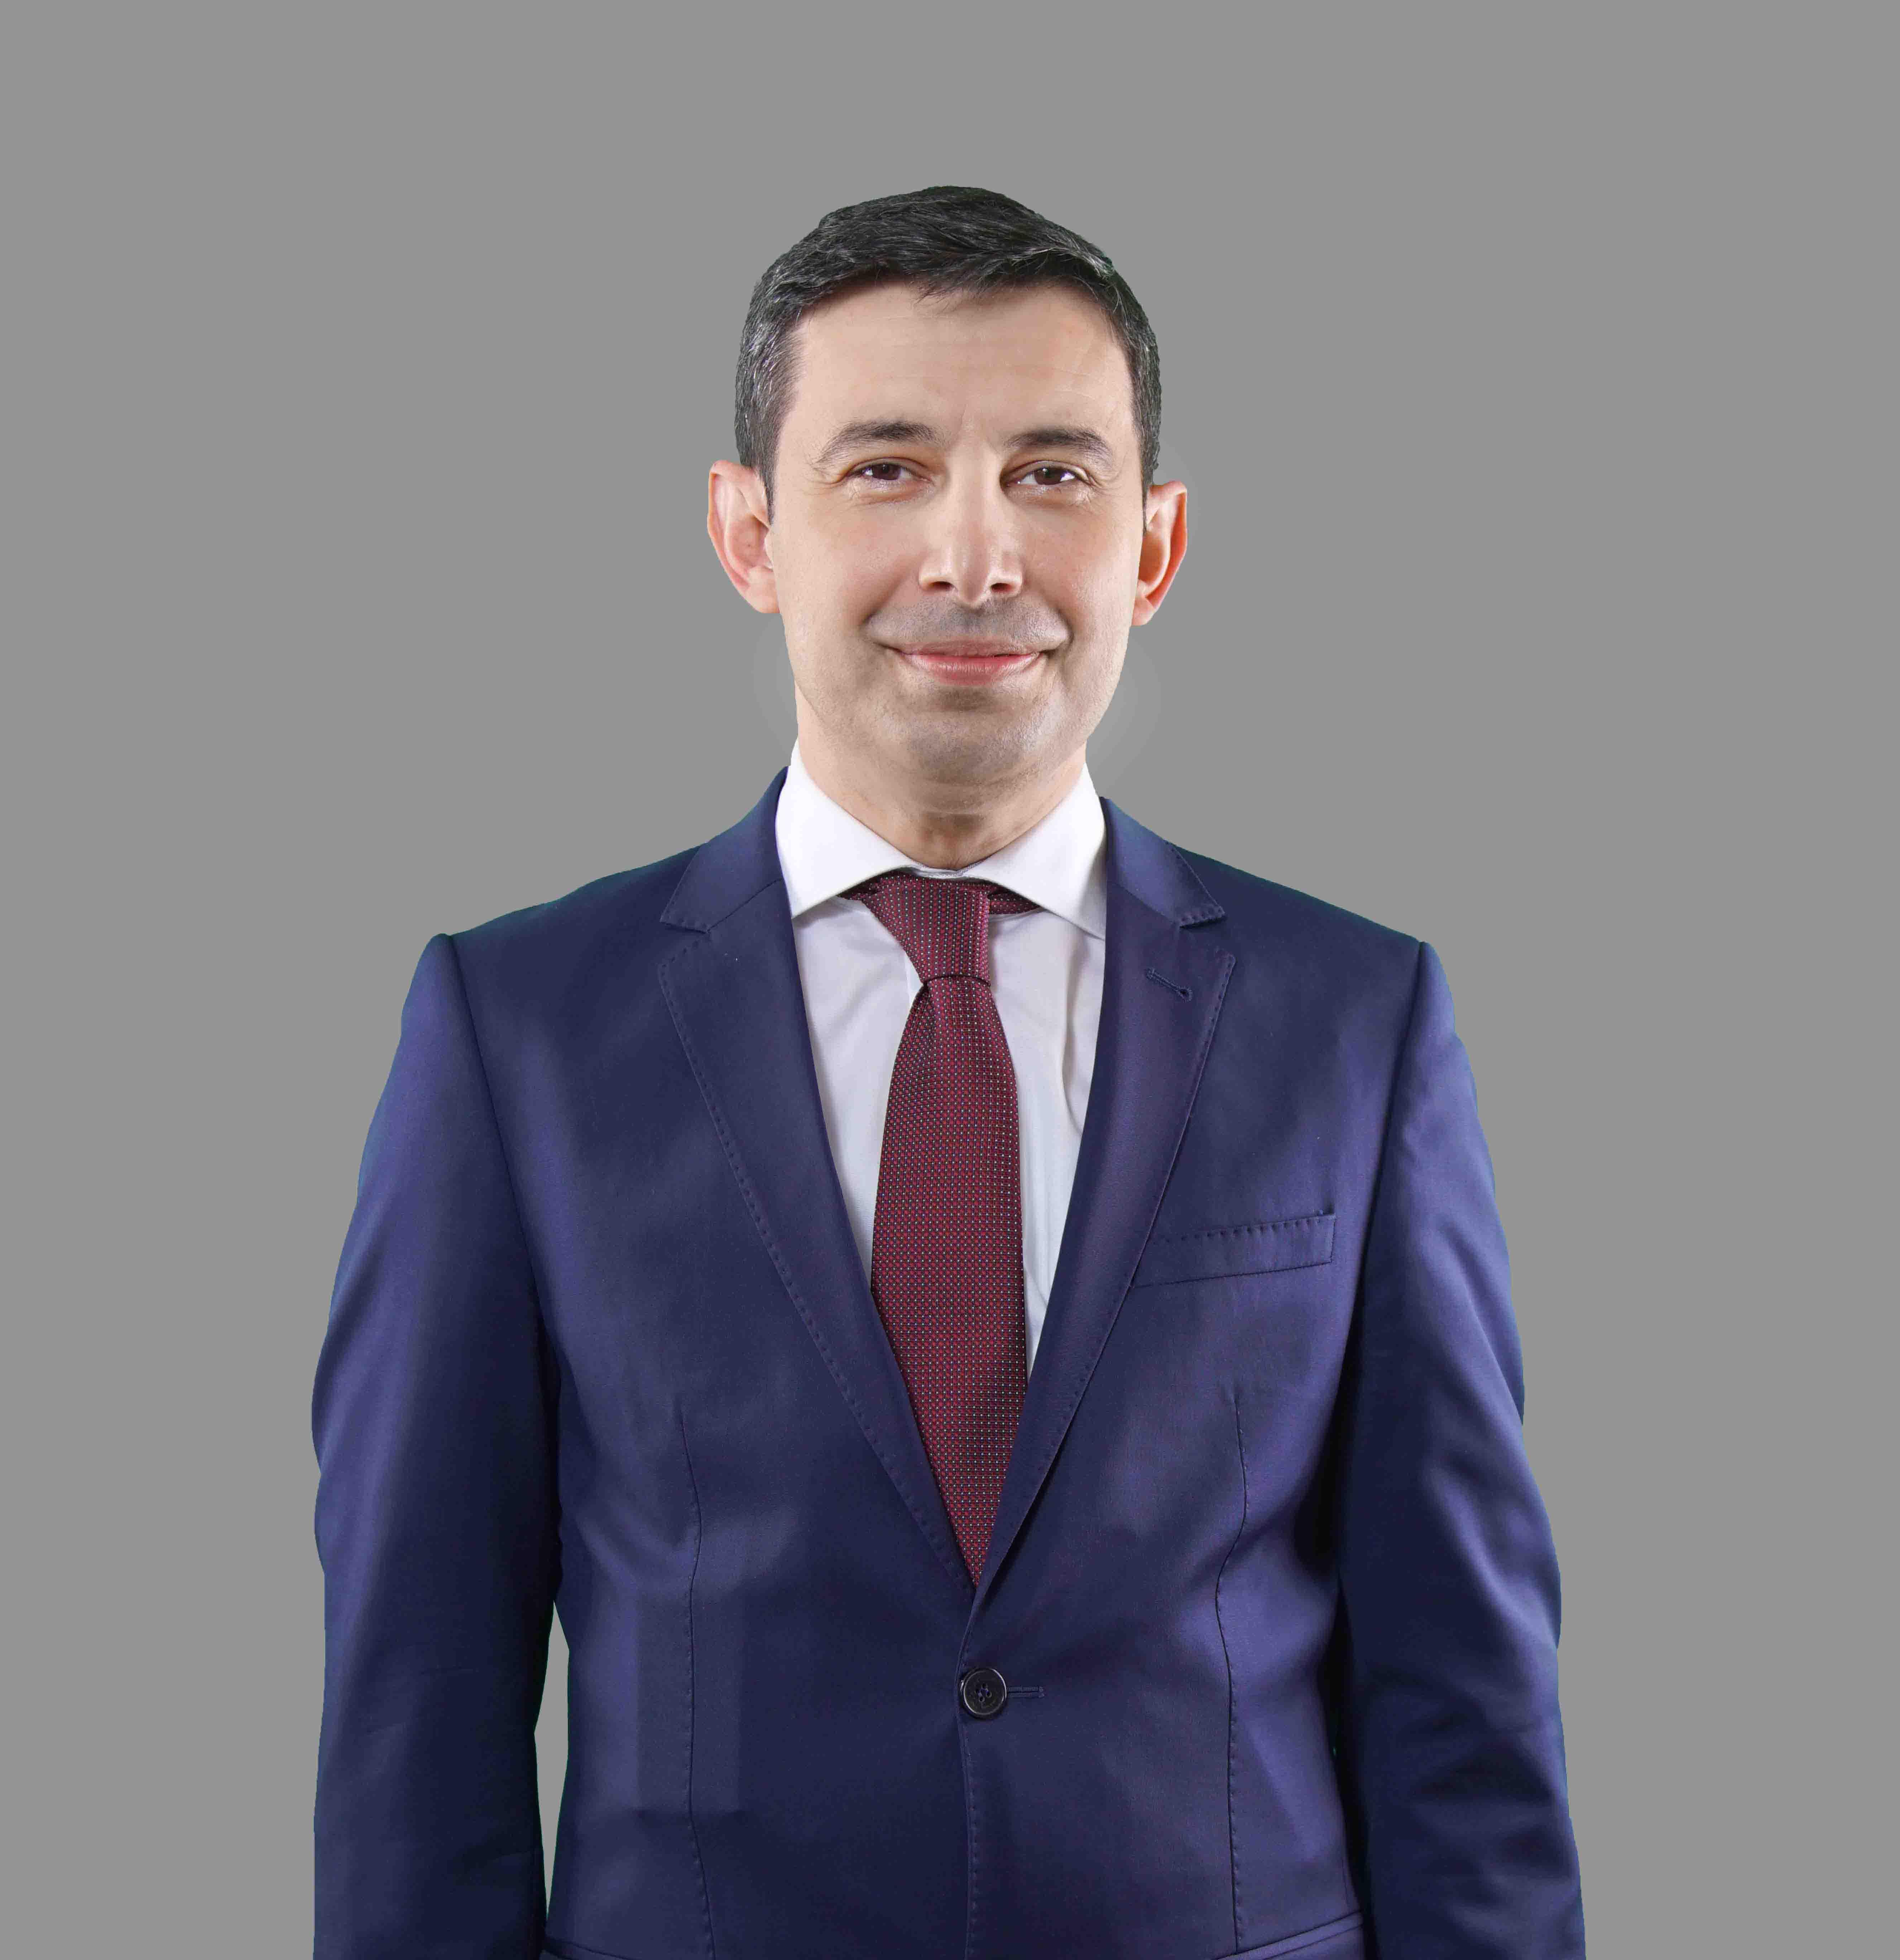 Mehmet Aytekin